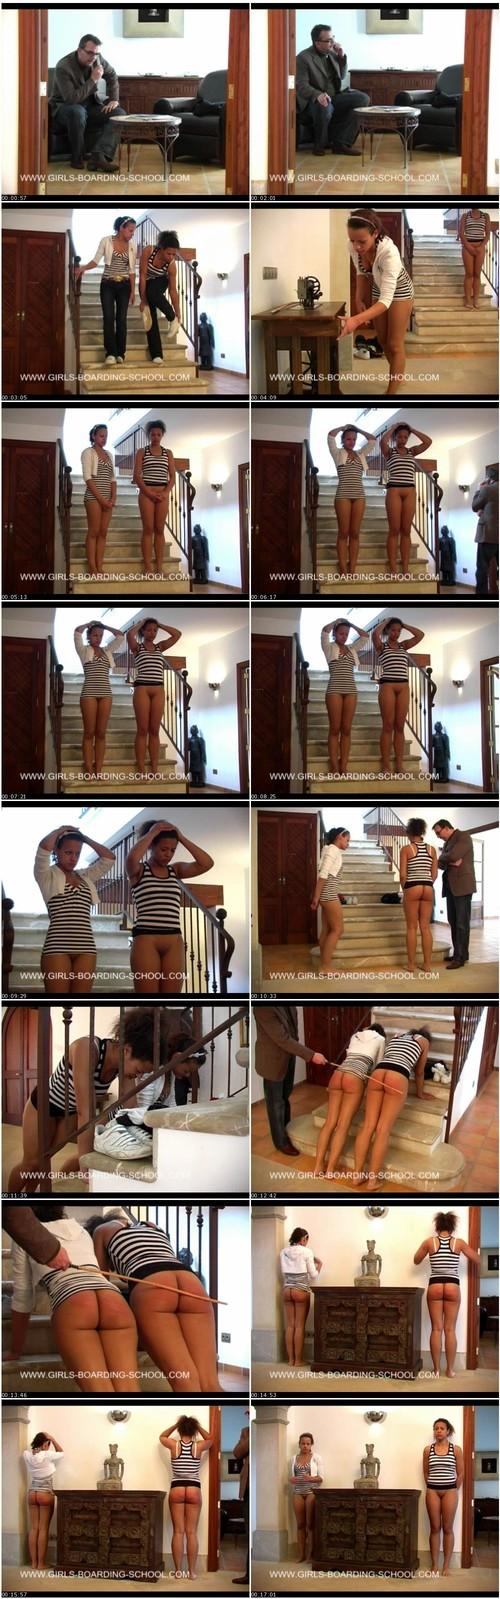 spanking071_thumb_m.jpg